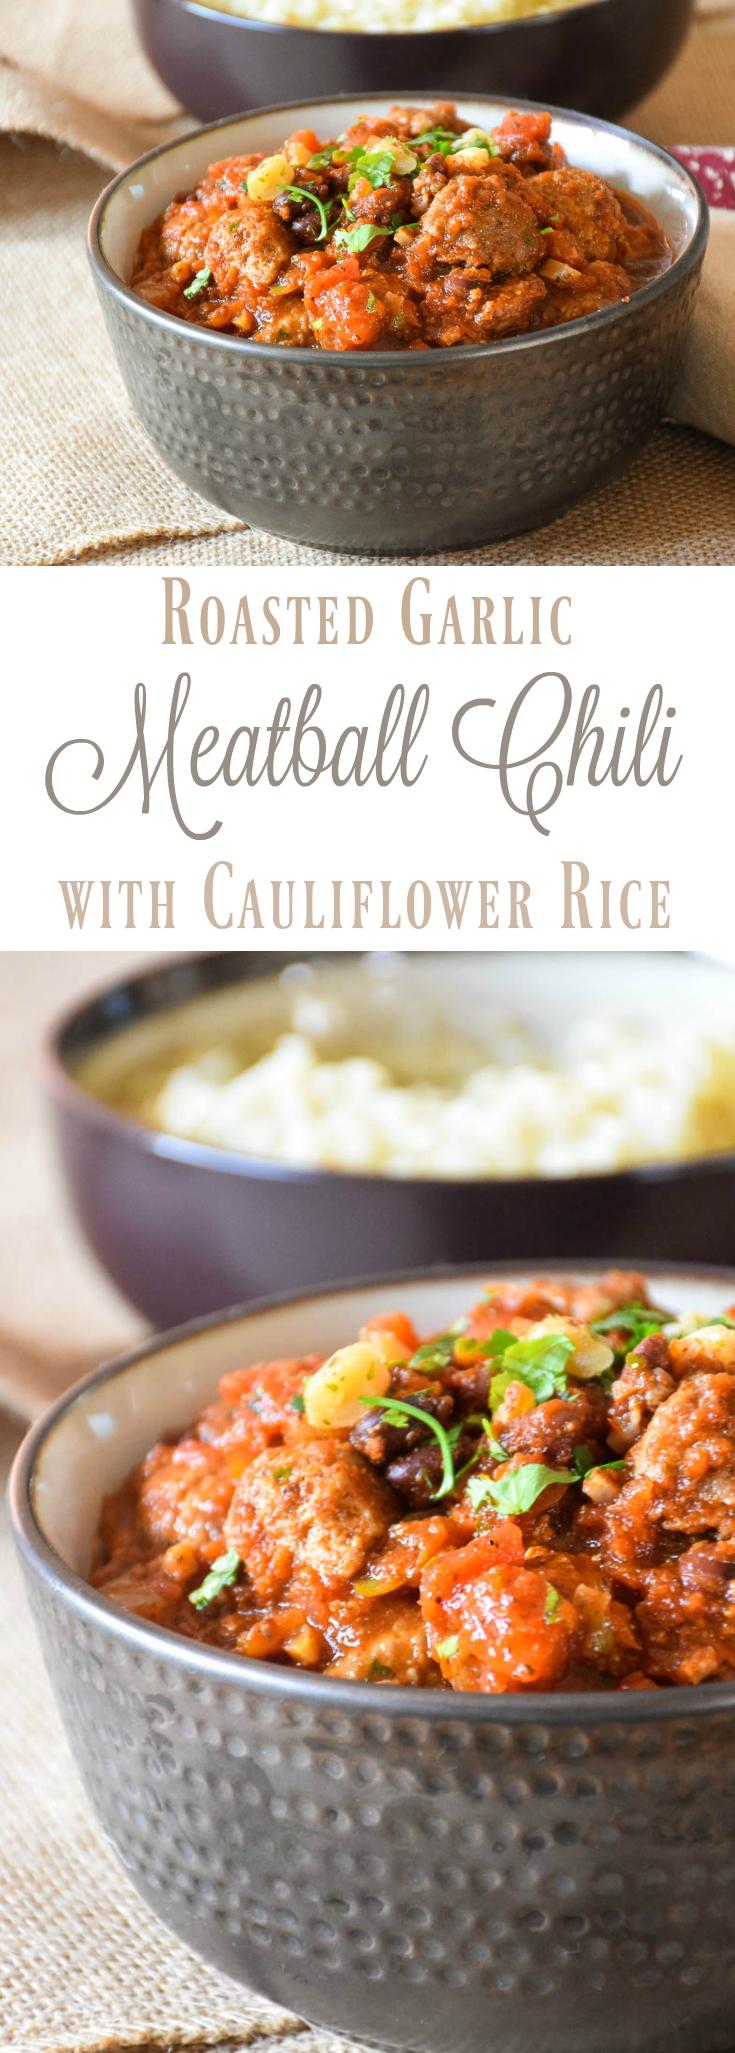 Meatball Chili